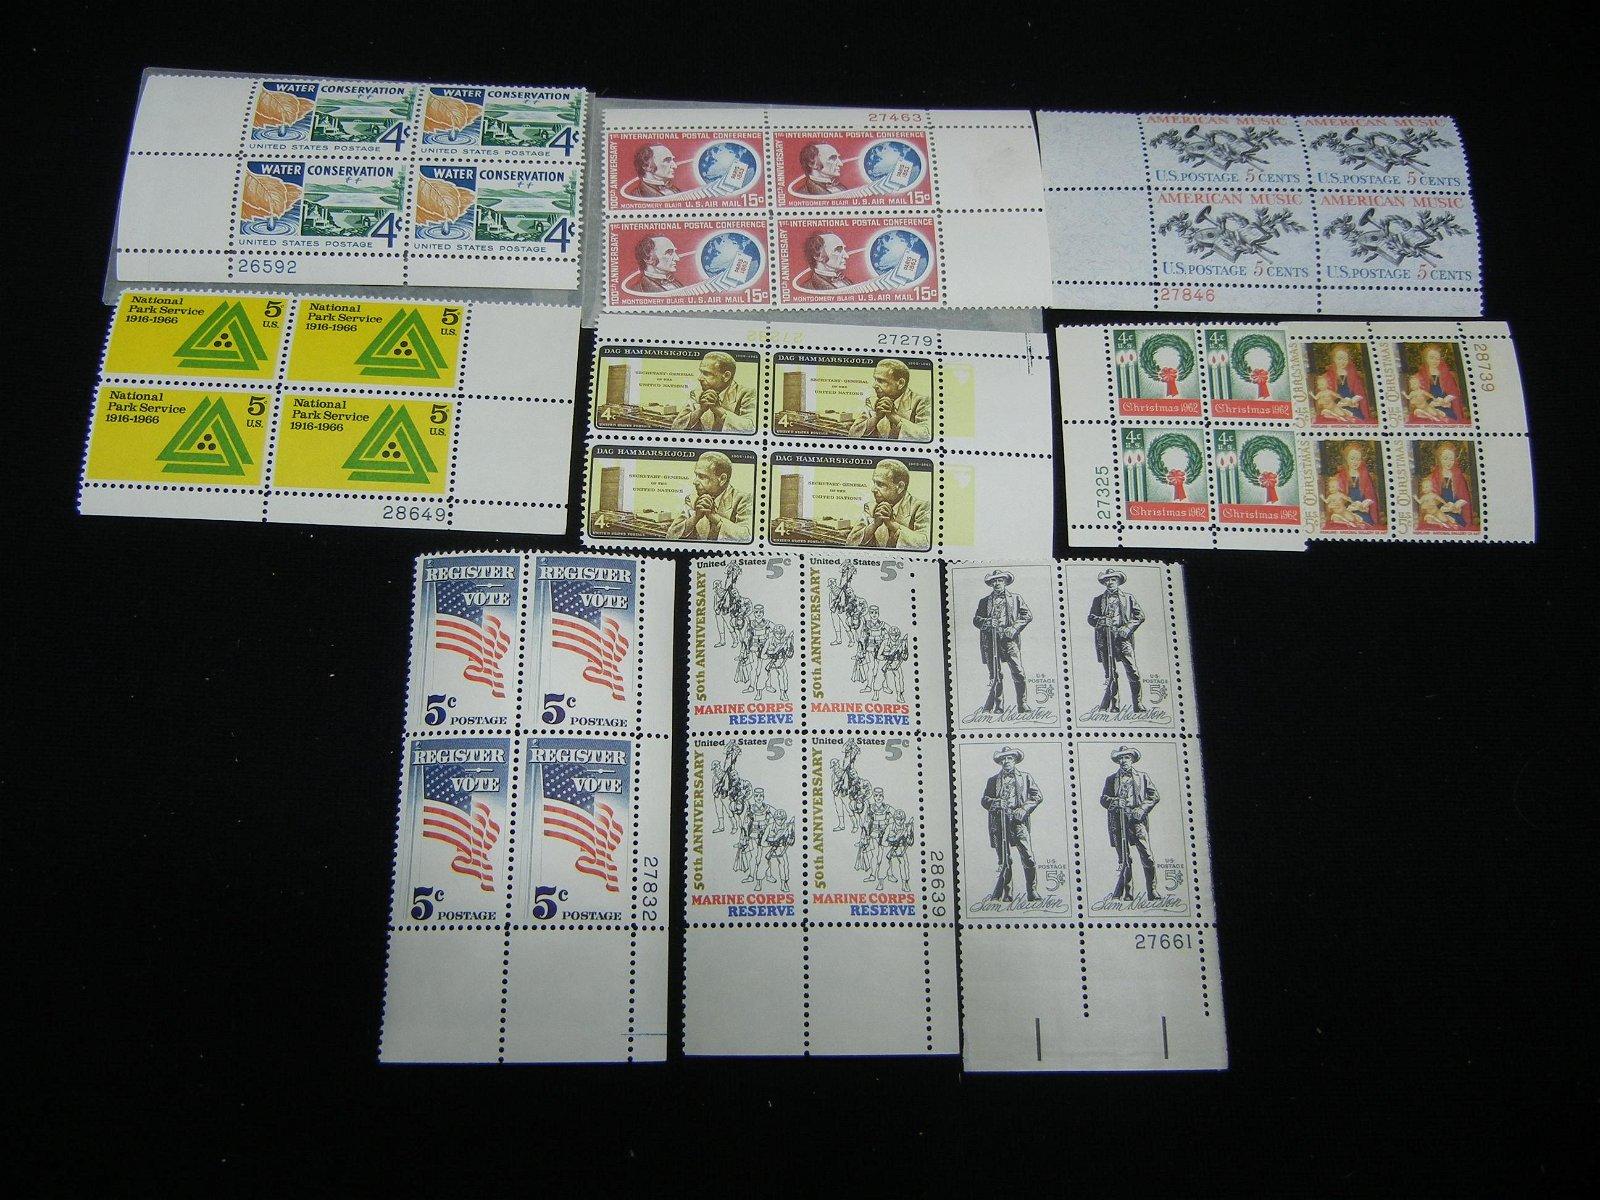 10 Vintage Unused Plate Block Stamps